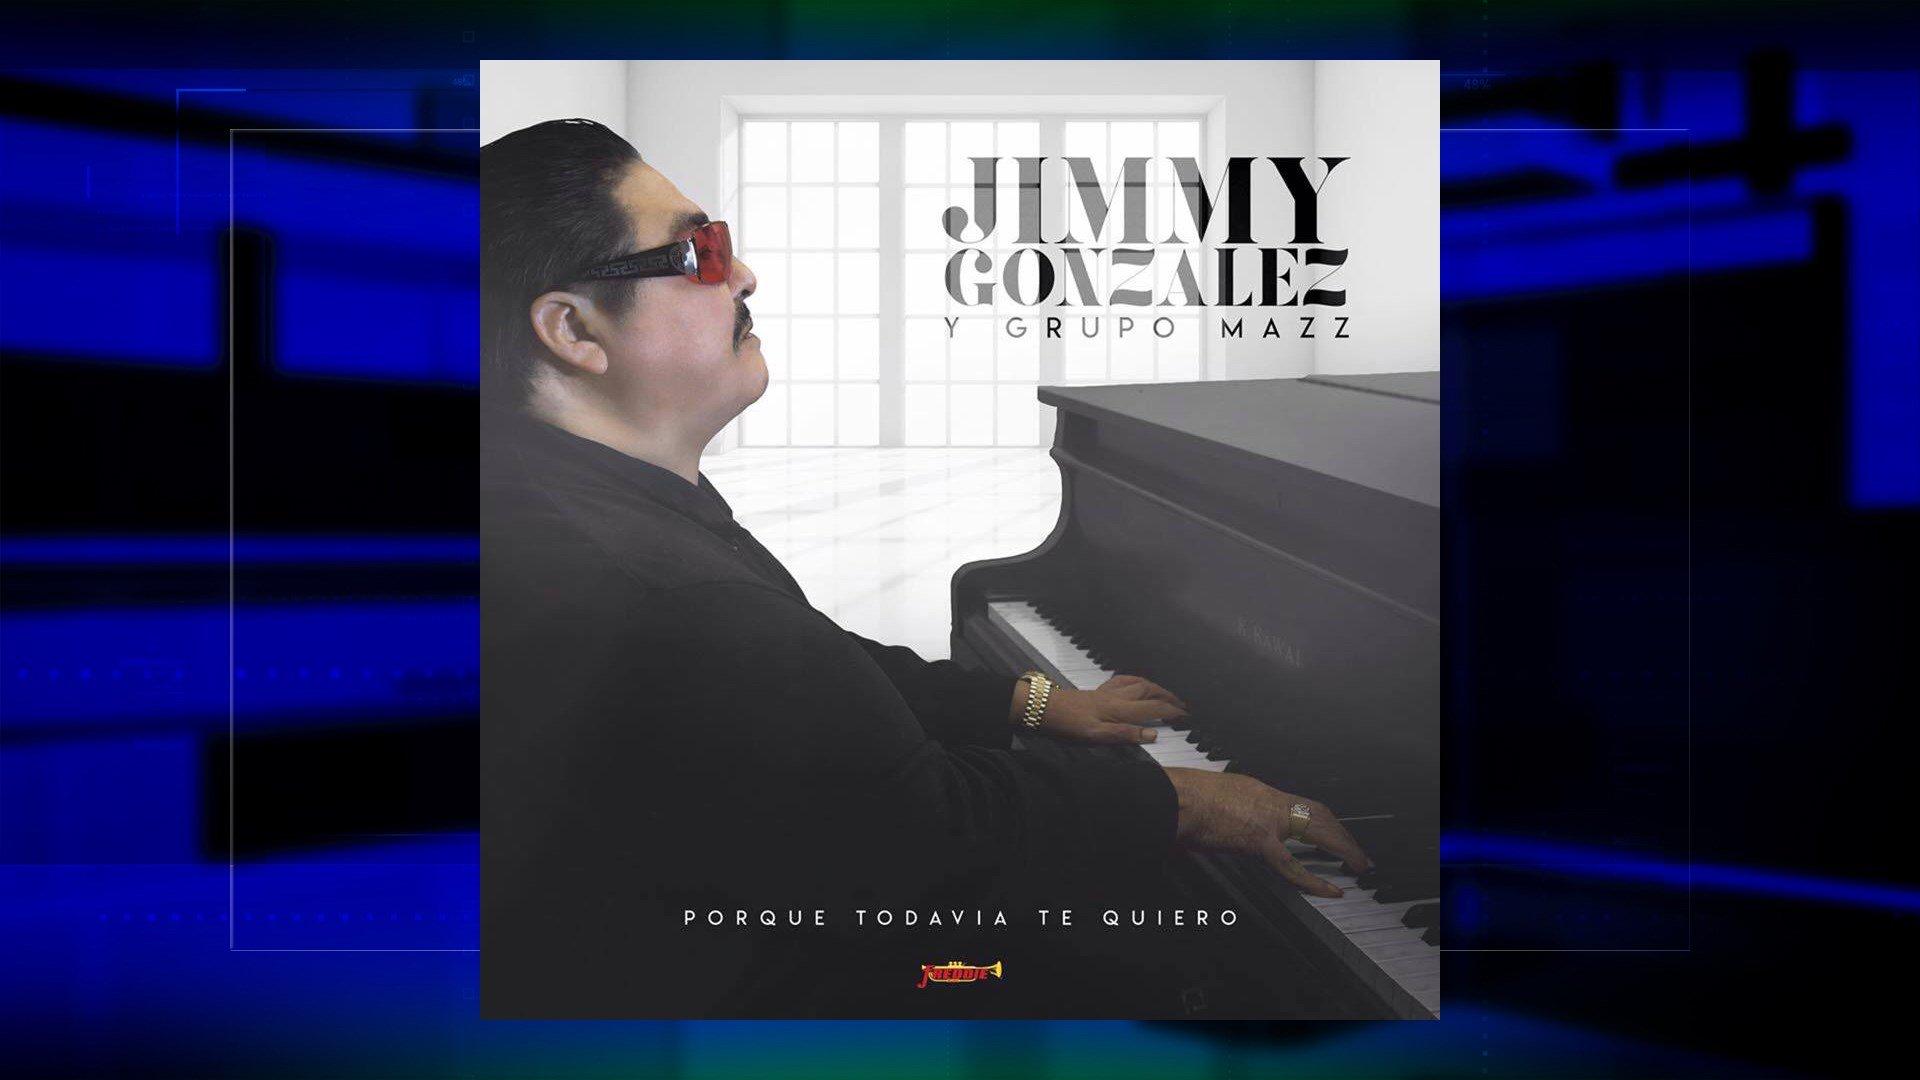 Tejano legend Jimmy Gonzalez dies